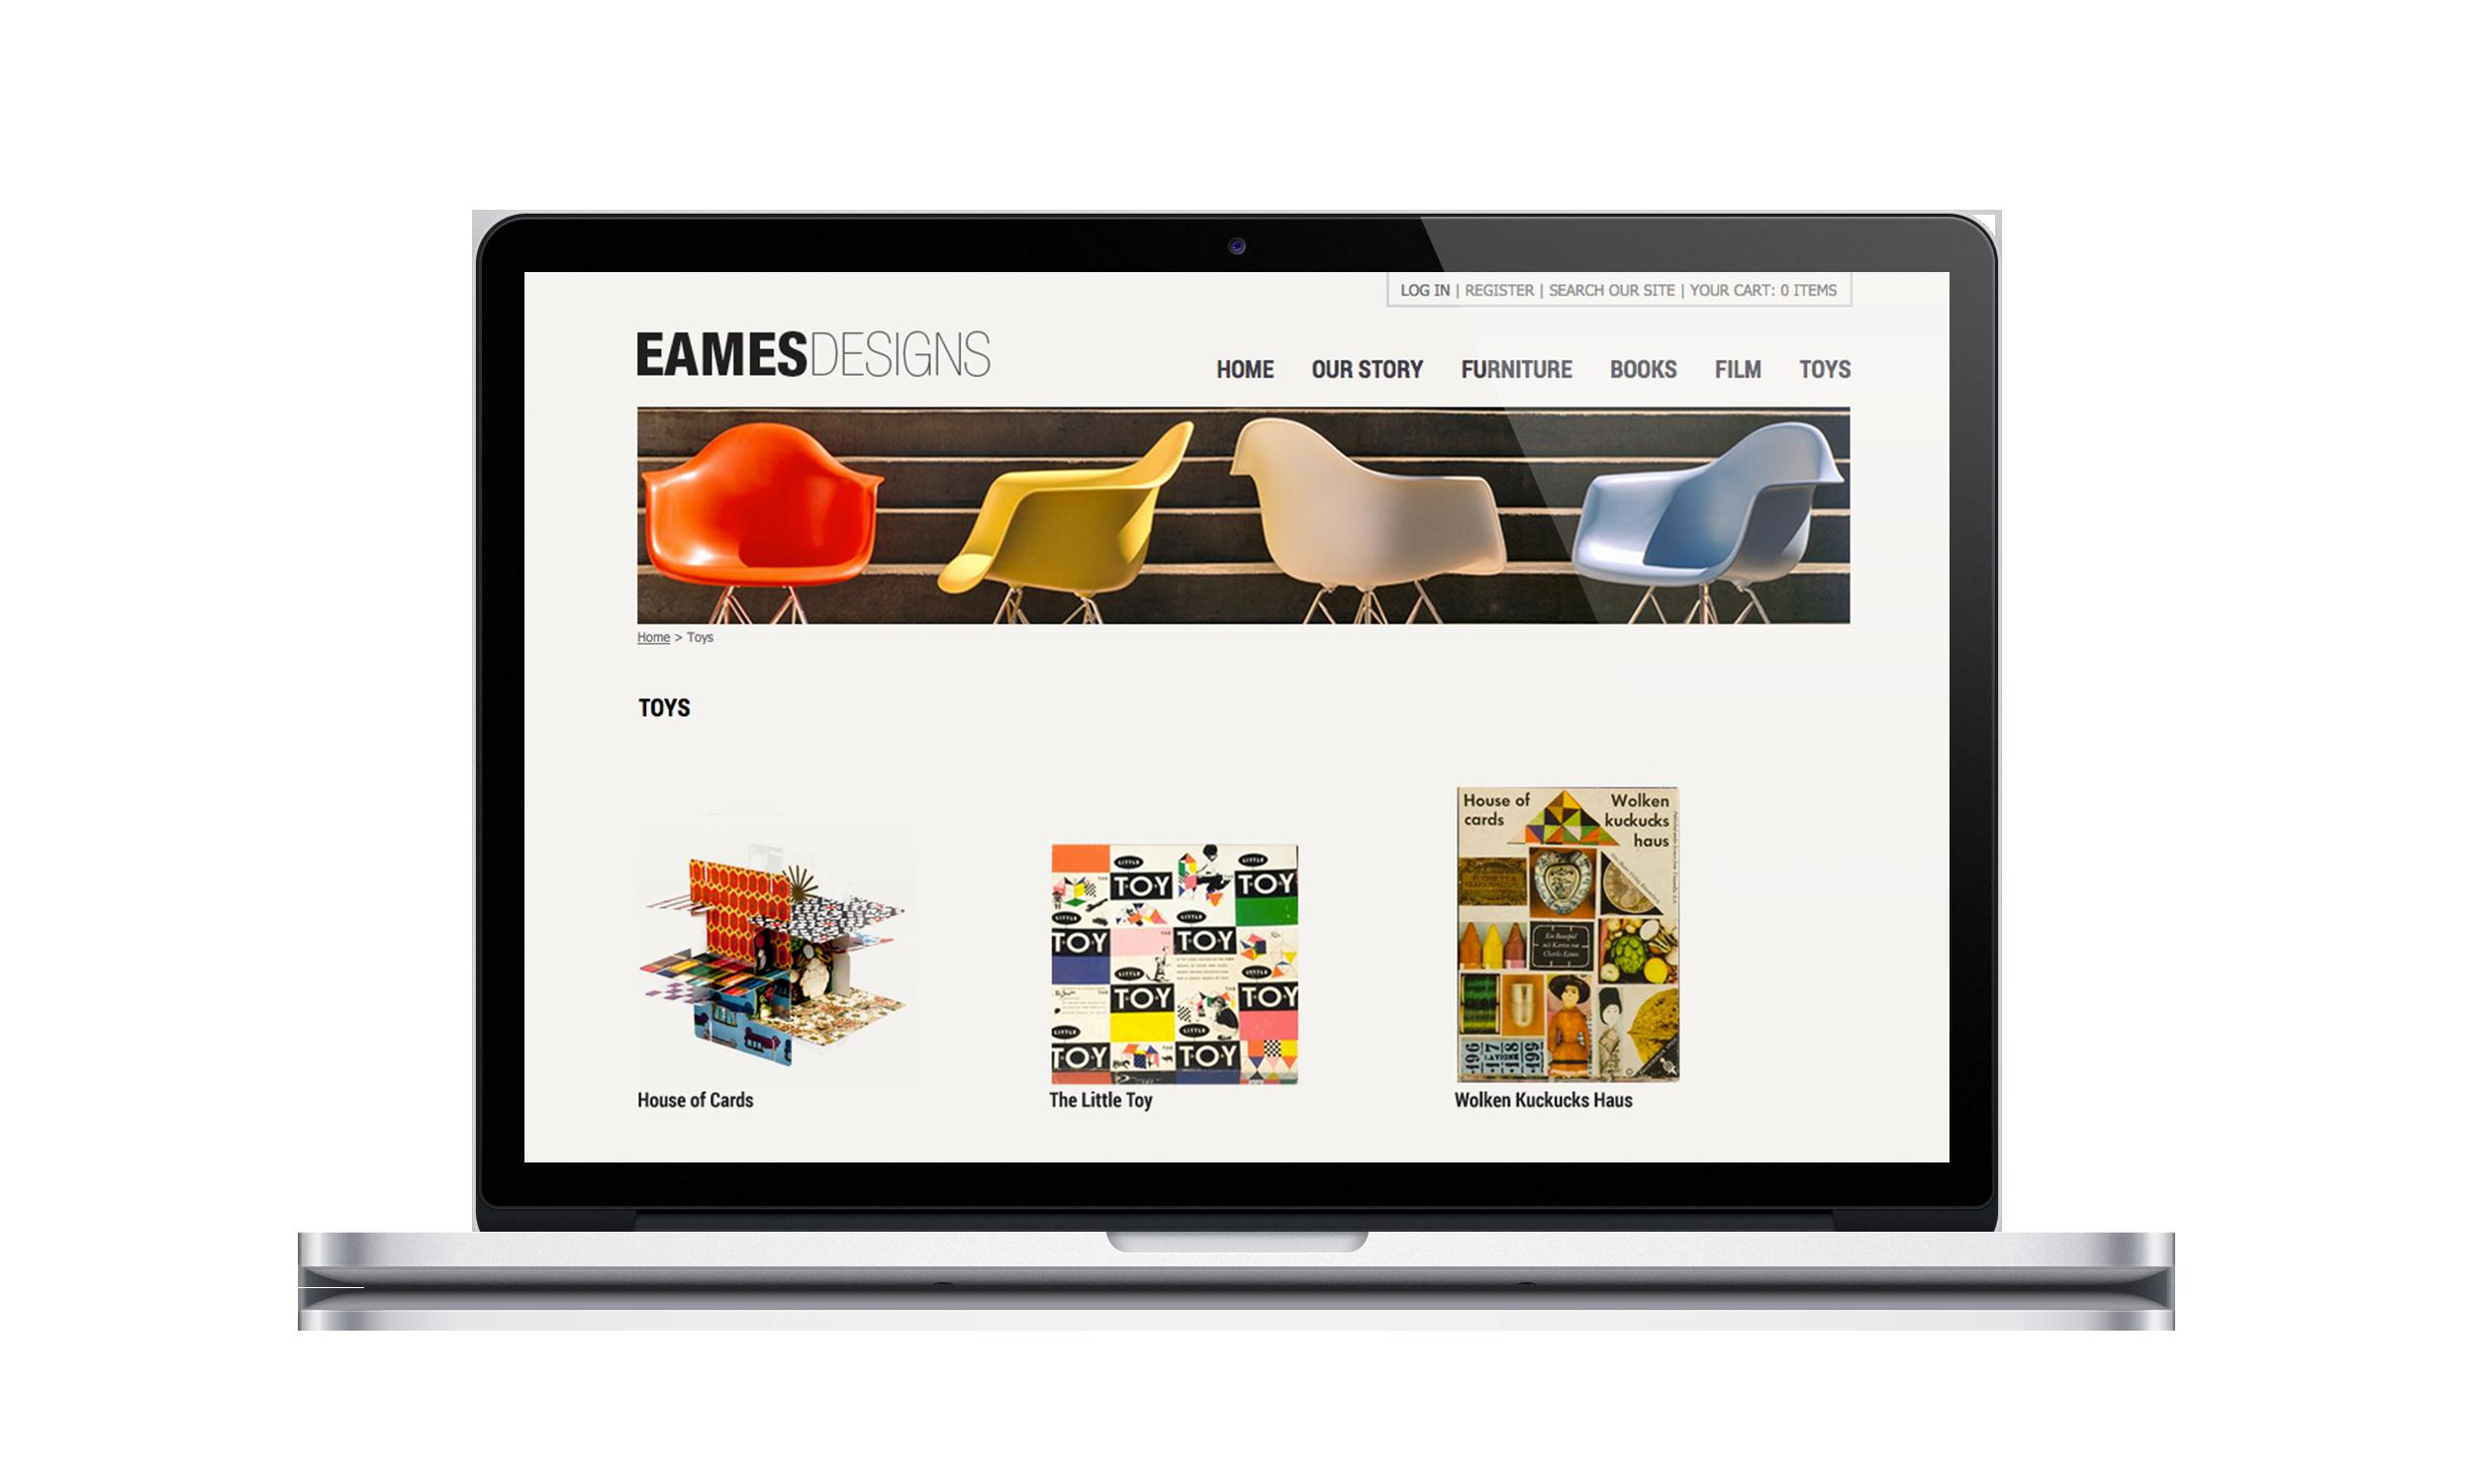 Eames Design Website Toys